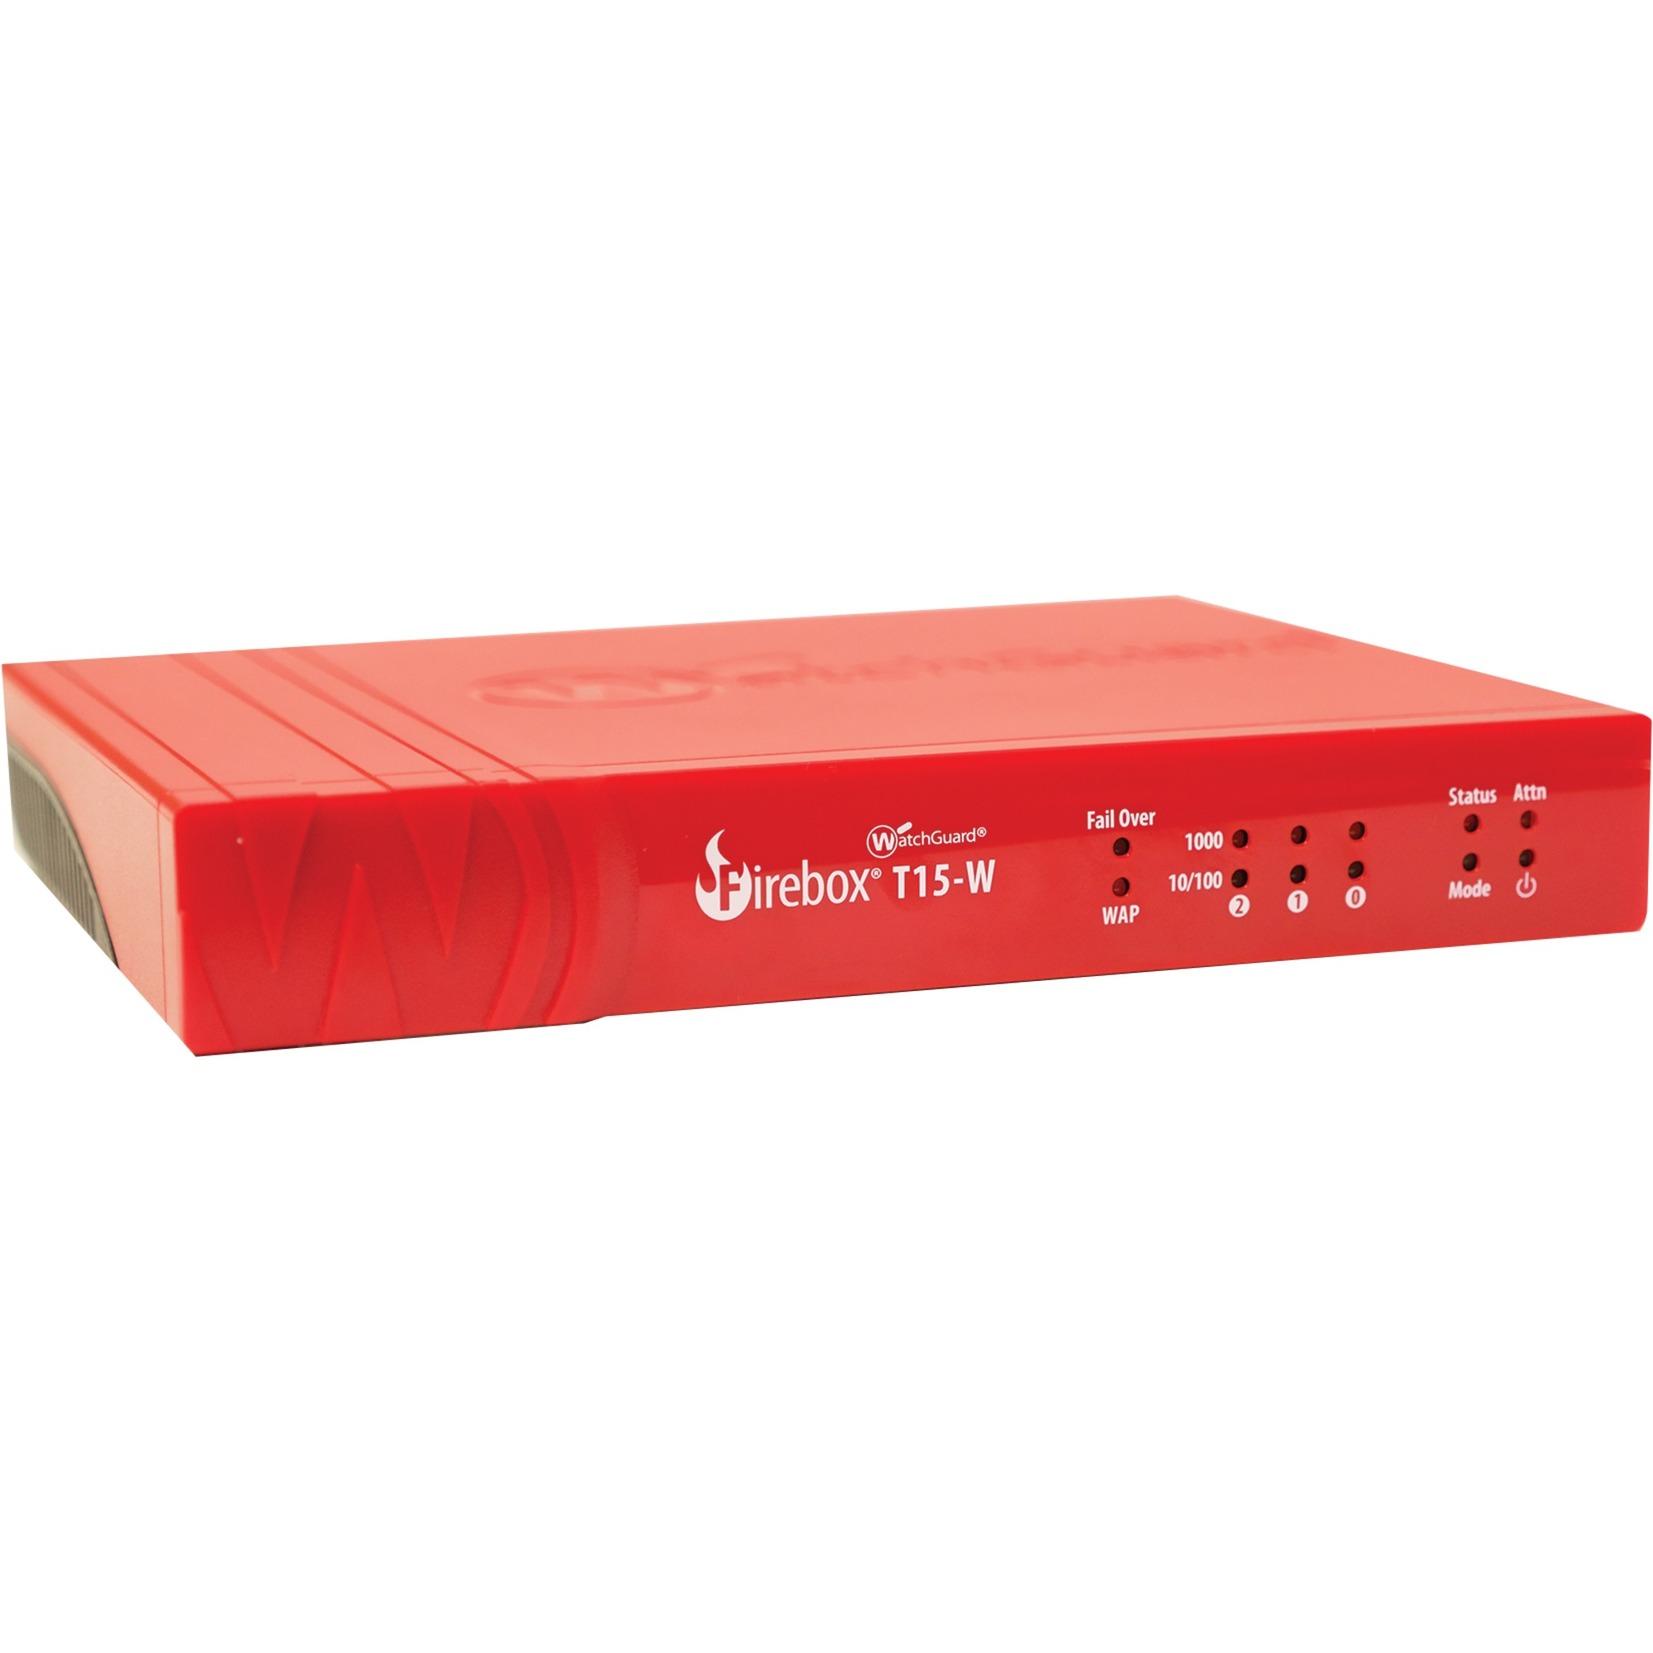 Firebox WGT16031-WW cortafuegos (hardware) 400 Mbit/s